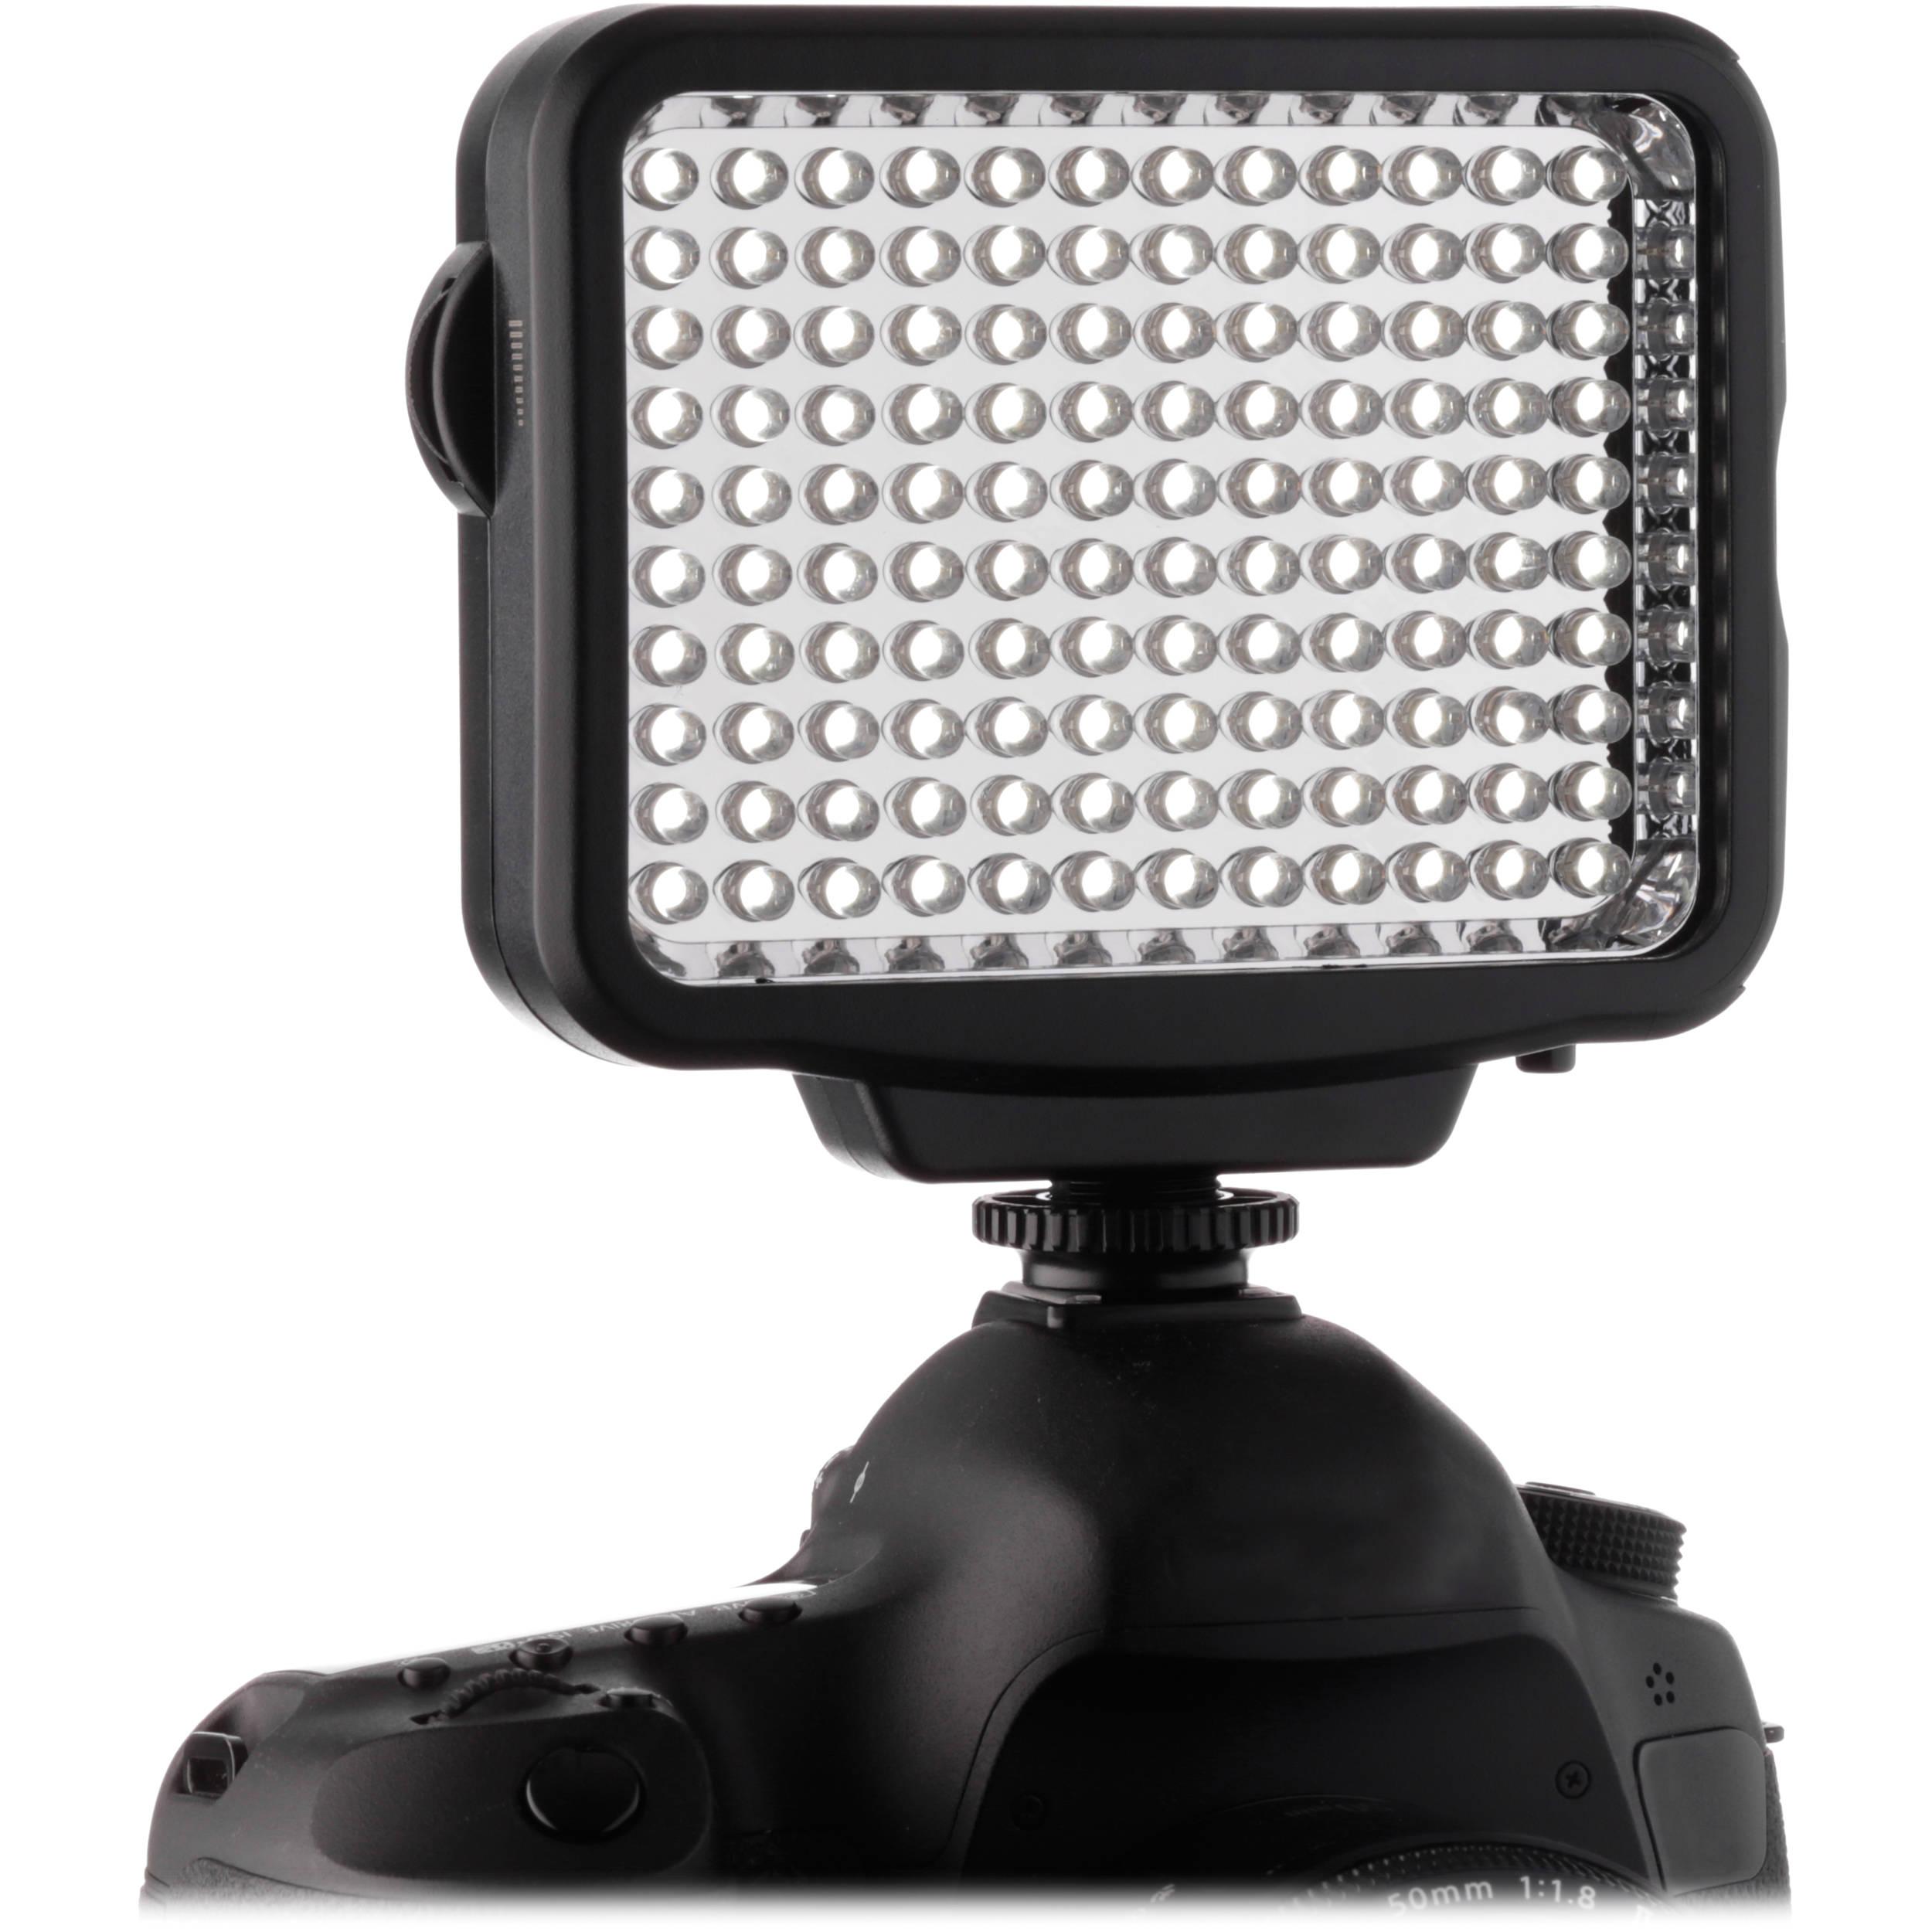 Genaray LED-5300 120 LED Dimmable Compact On-Camera LED